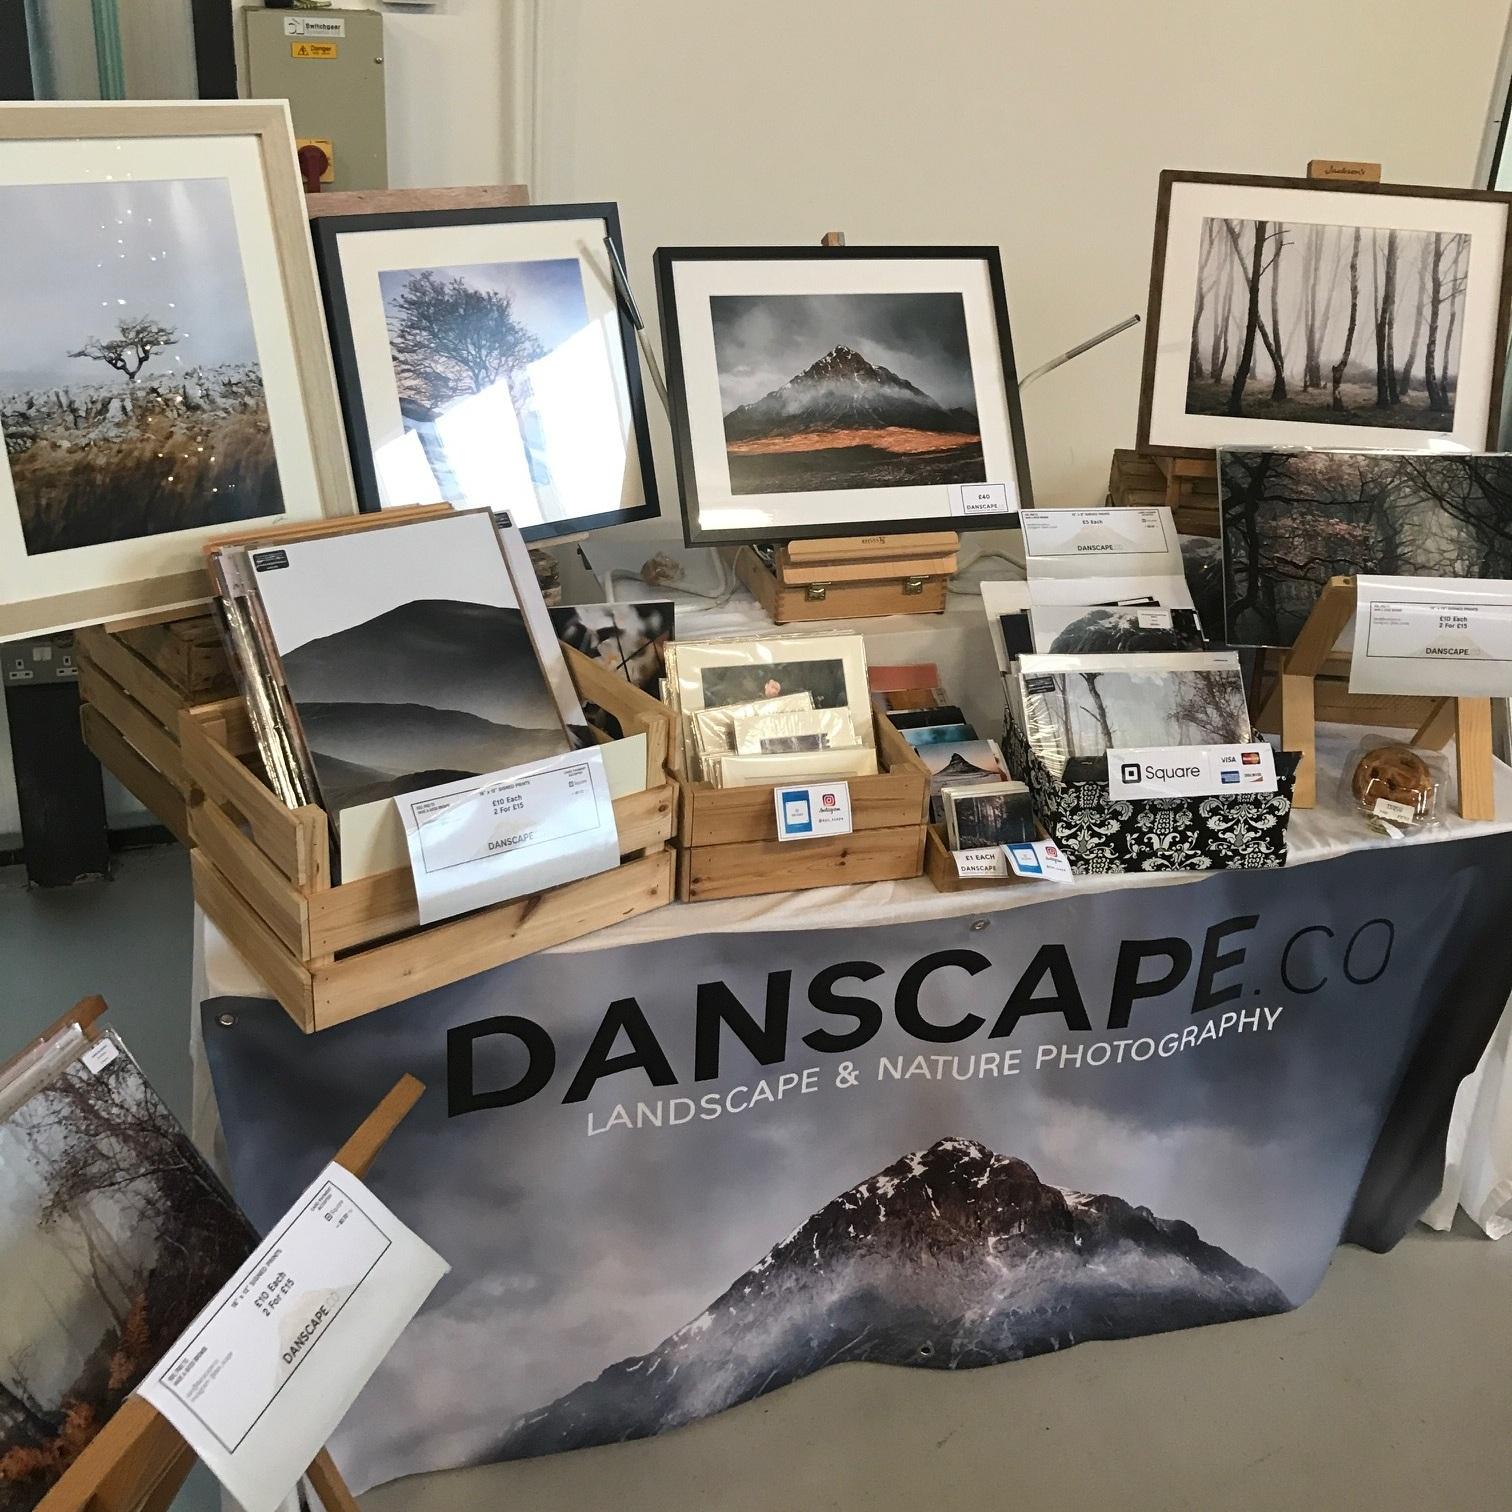 Danscape+Print+Stall+Bristol+2019